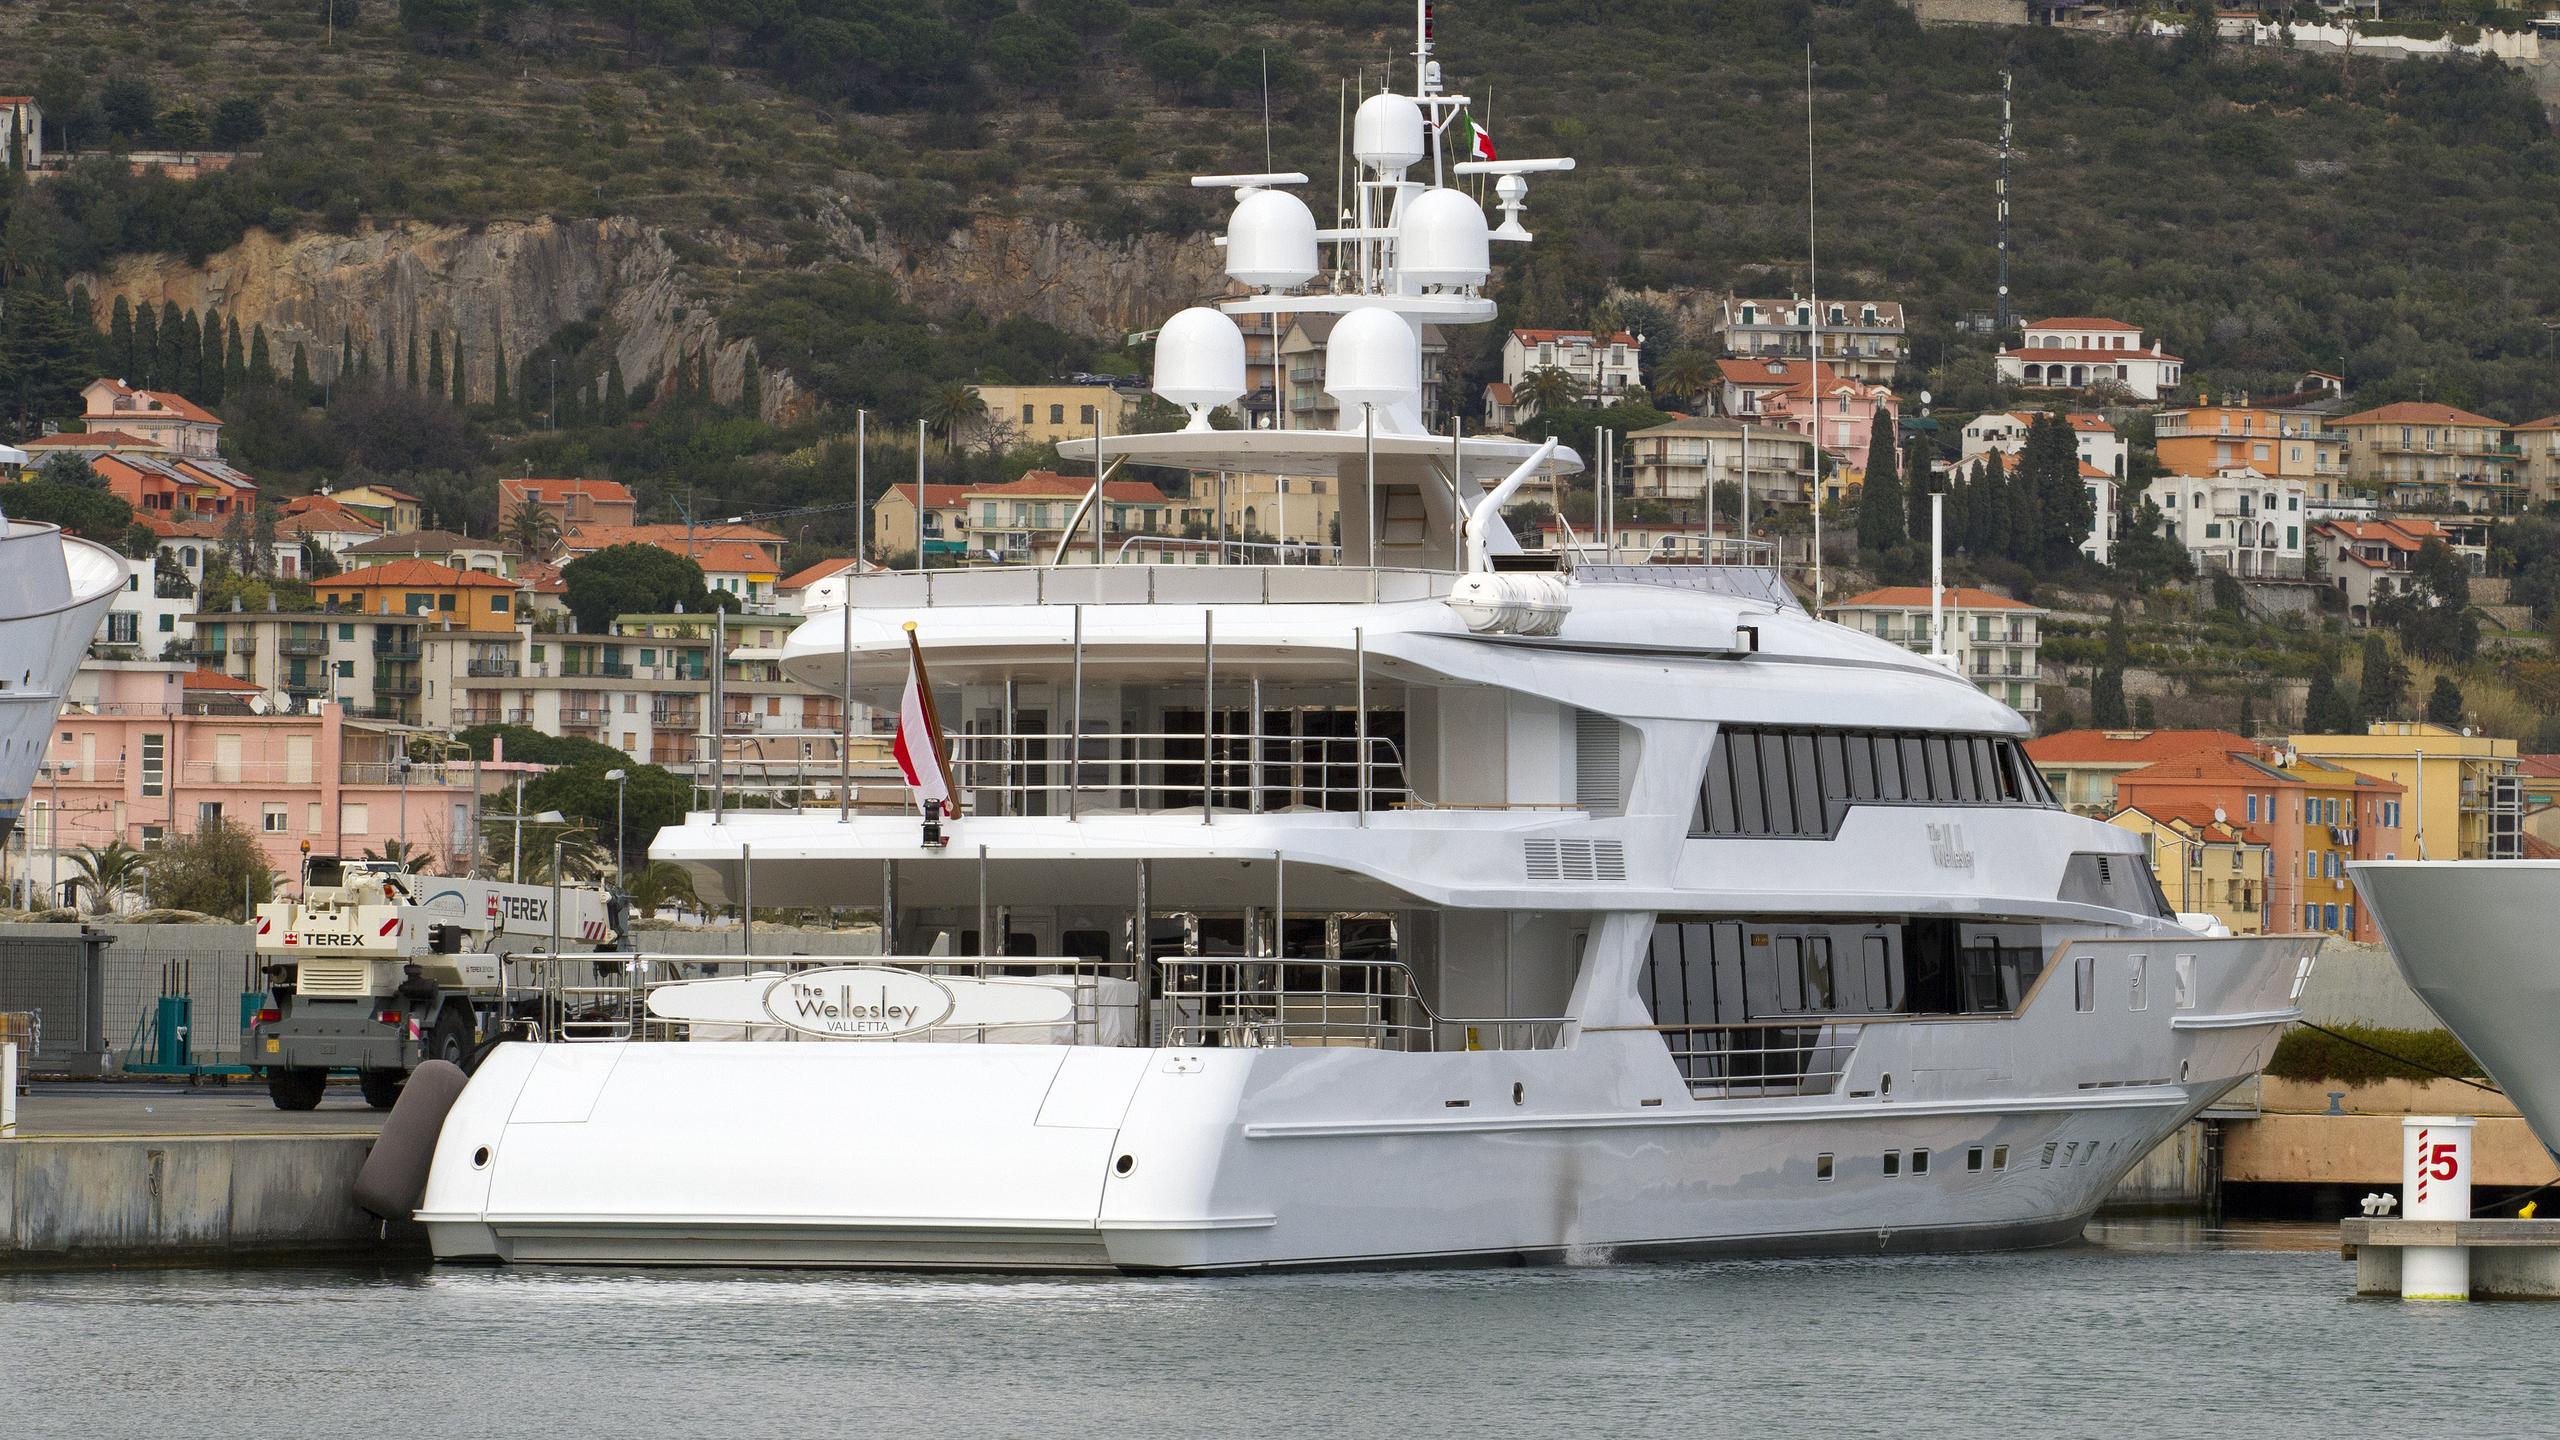 the-wellesley-motor-yacht-oceanco-1993-56m-new-stern